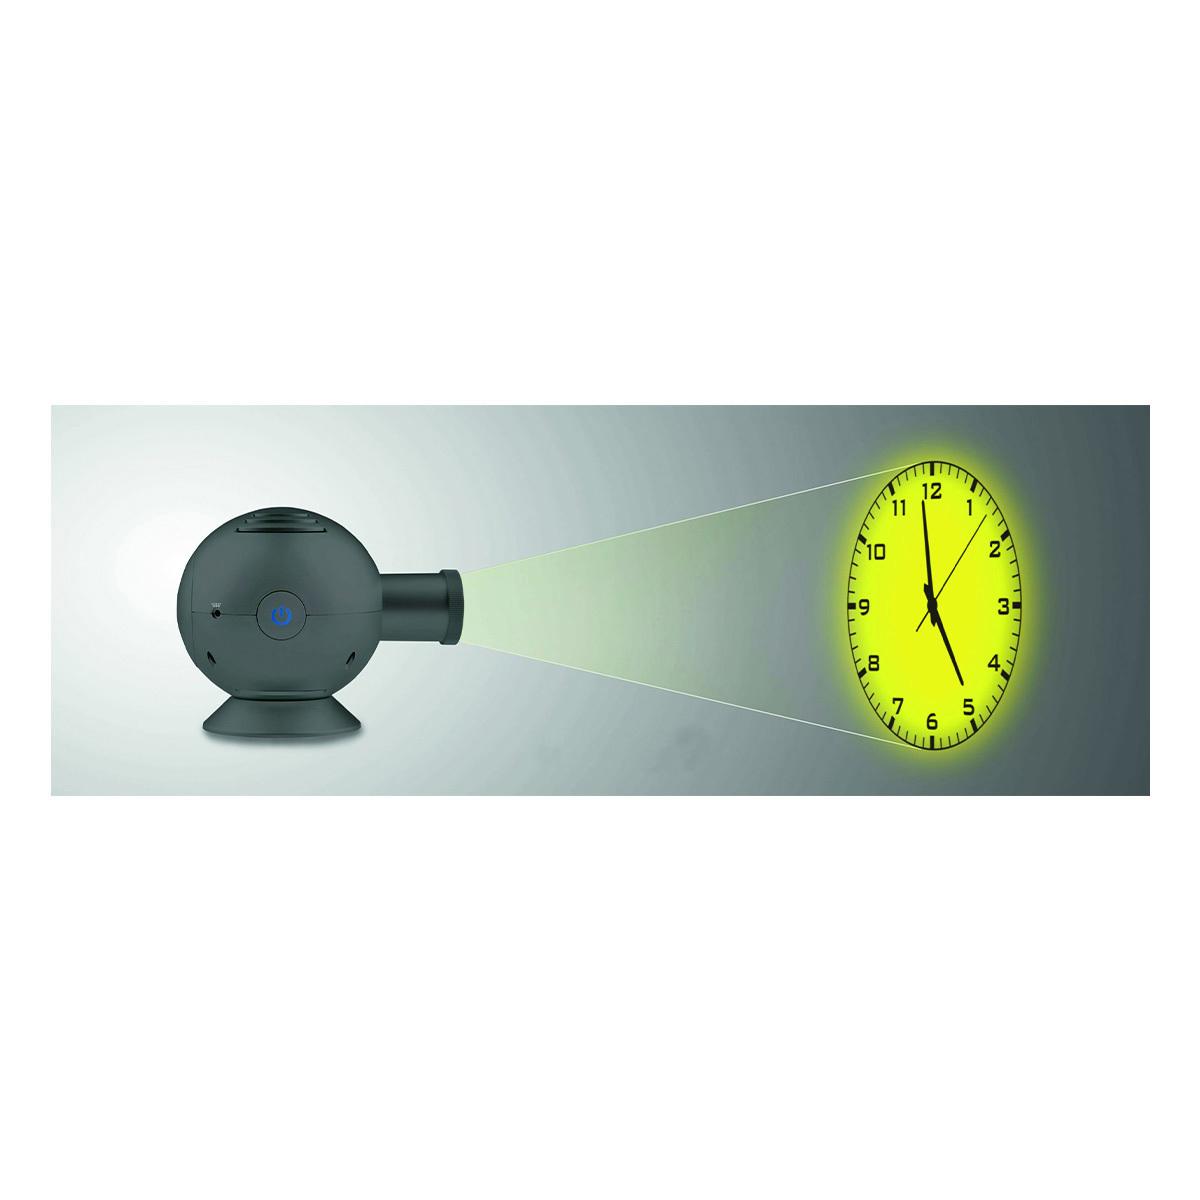 60-5007-analoge-projektionsuhr-time-ball-gelb-1200x1200px.jpg